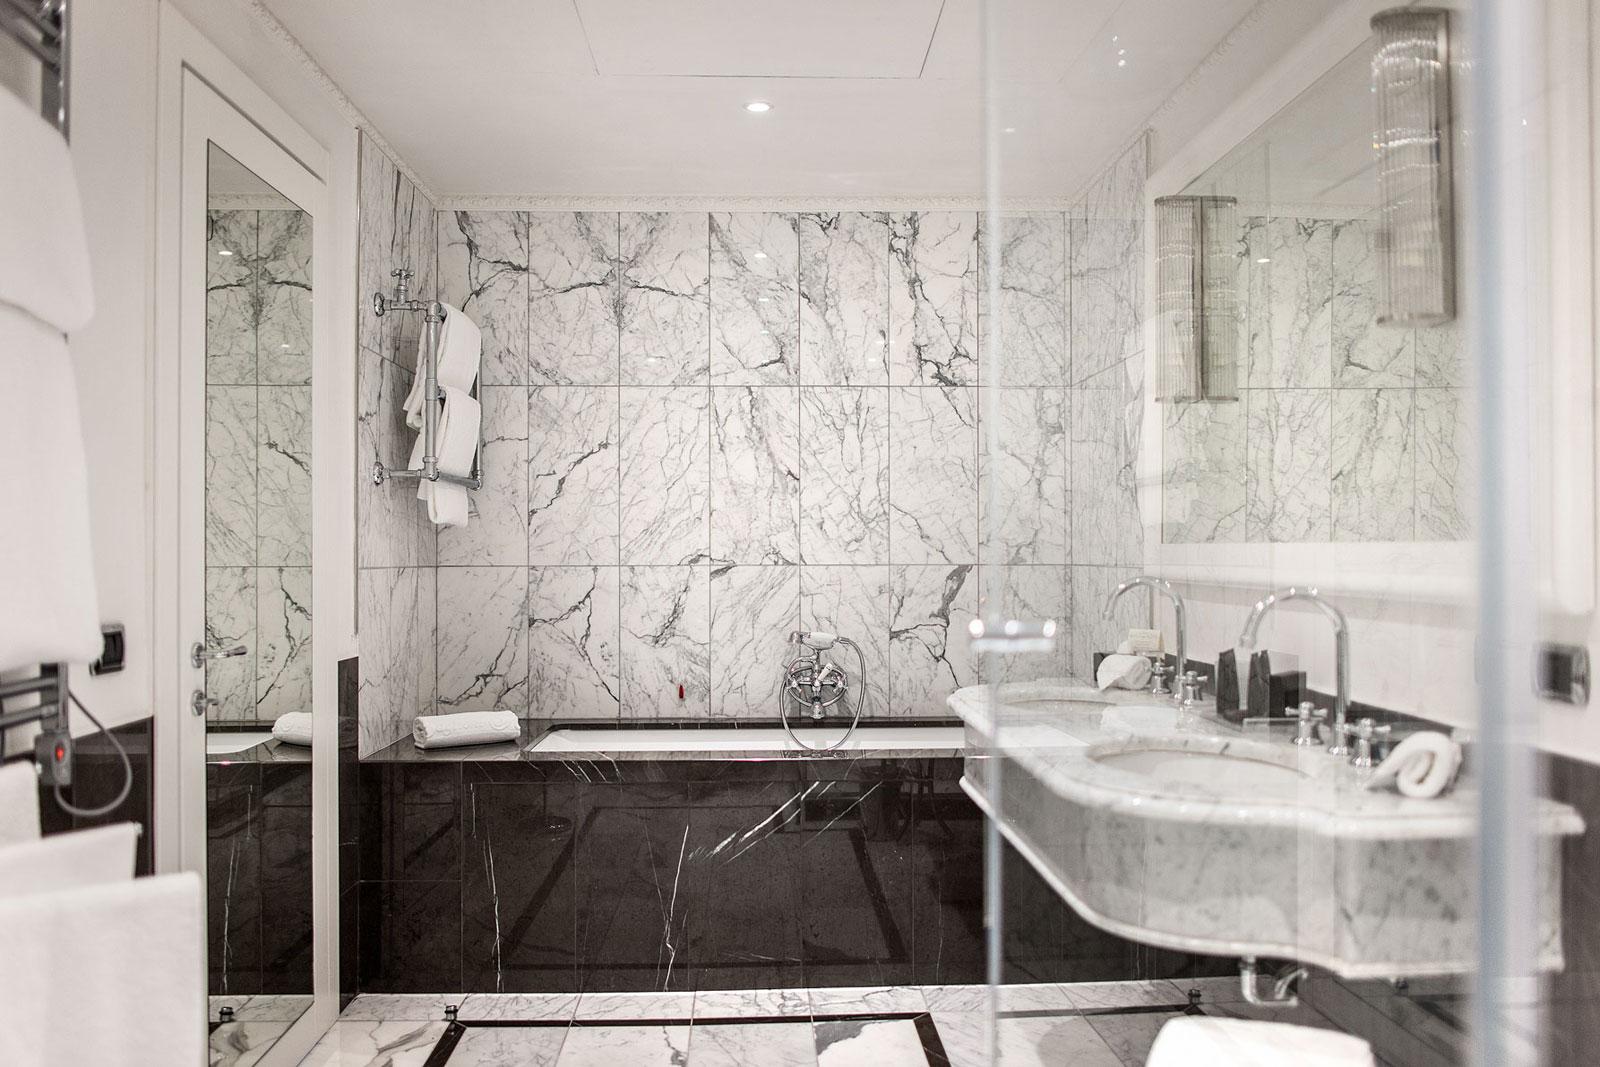 Baglioni Hotels_Margraf marble in luxury hotels - Margraf